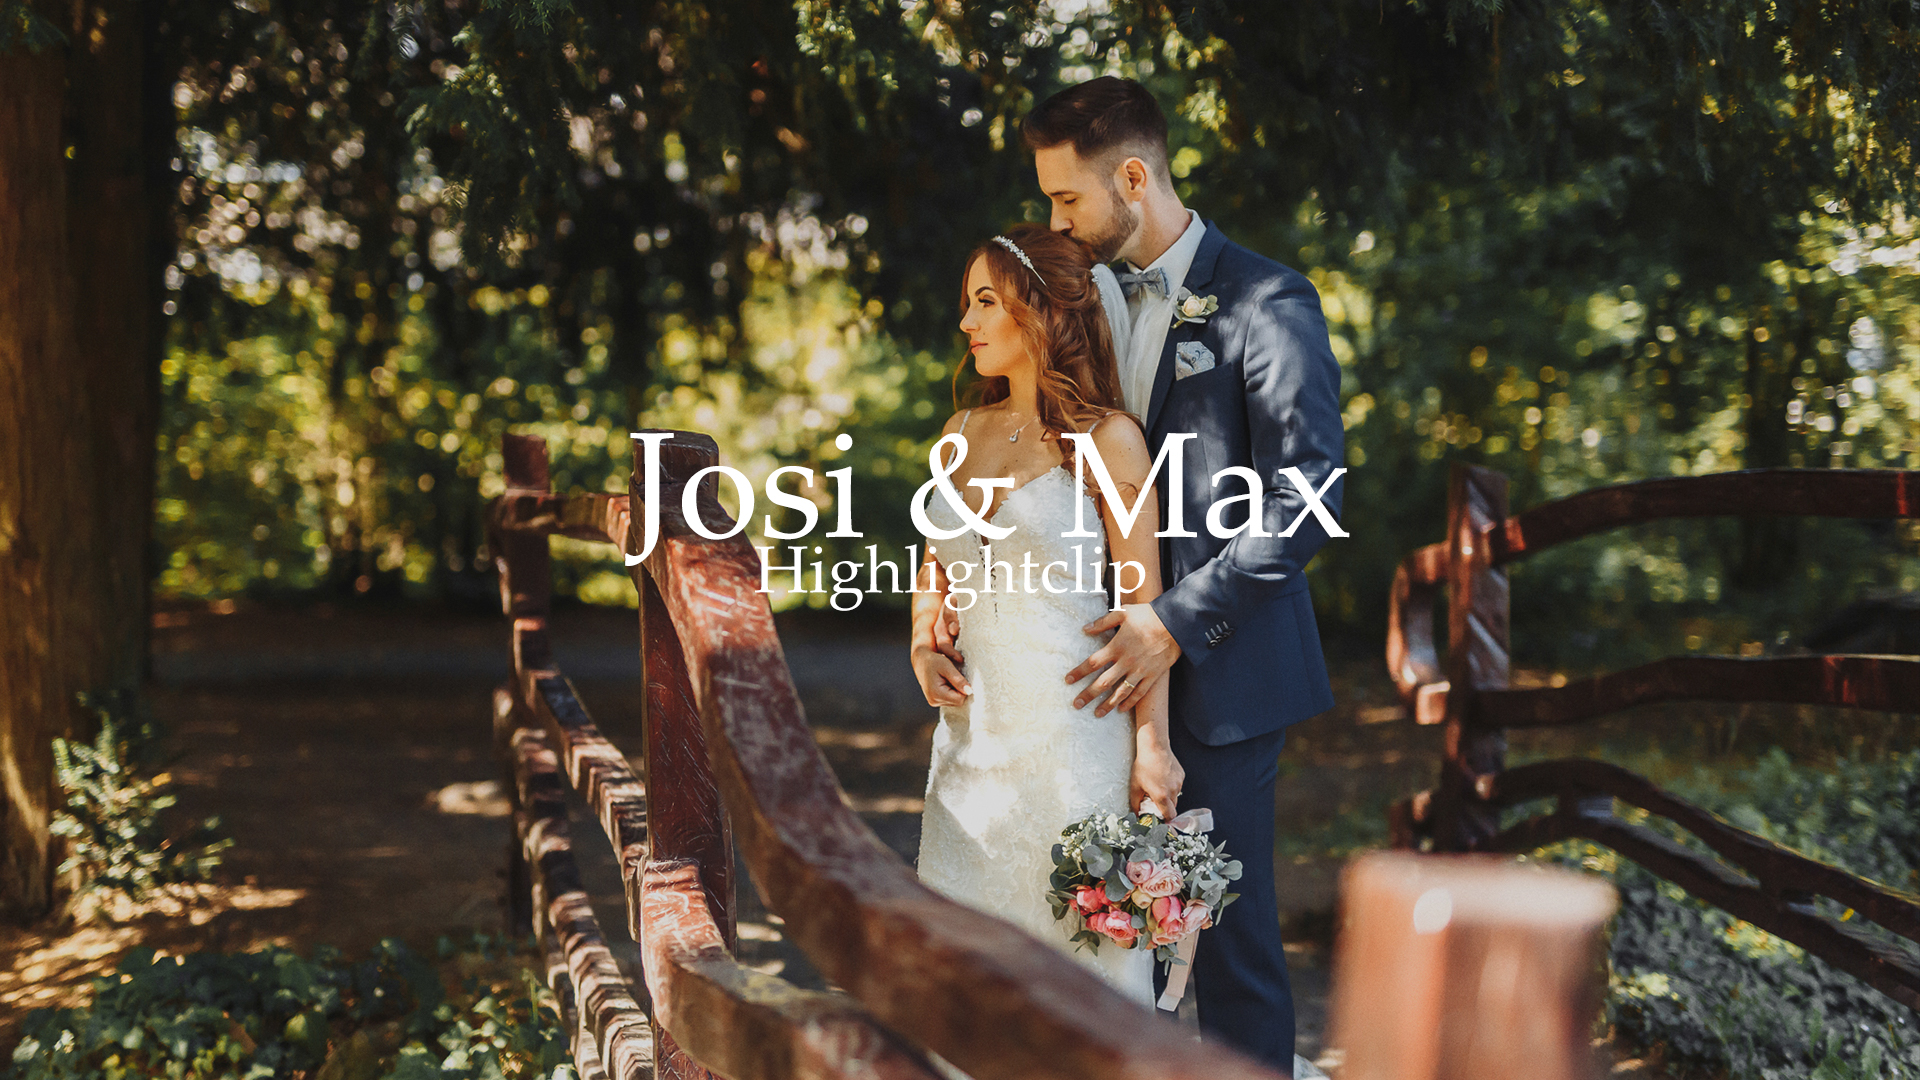 Josi & max